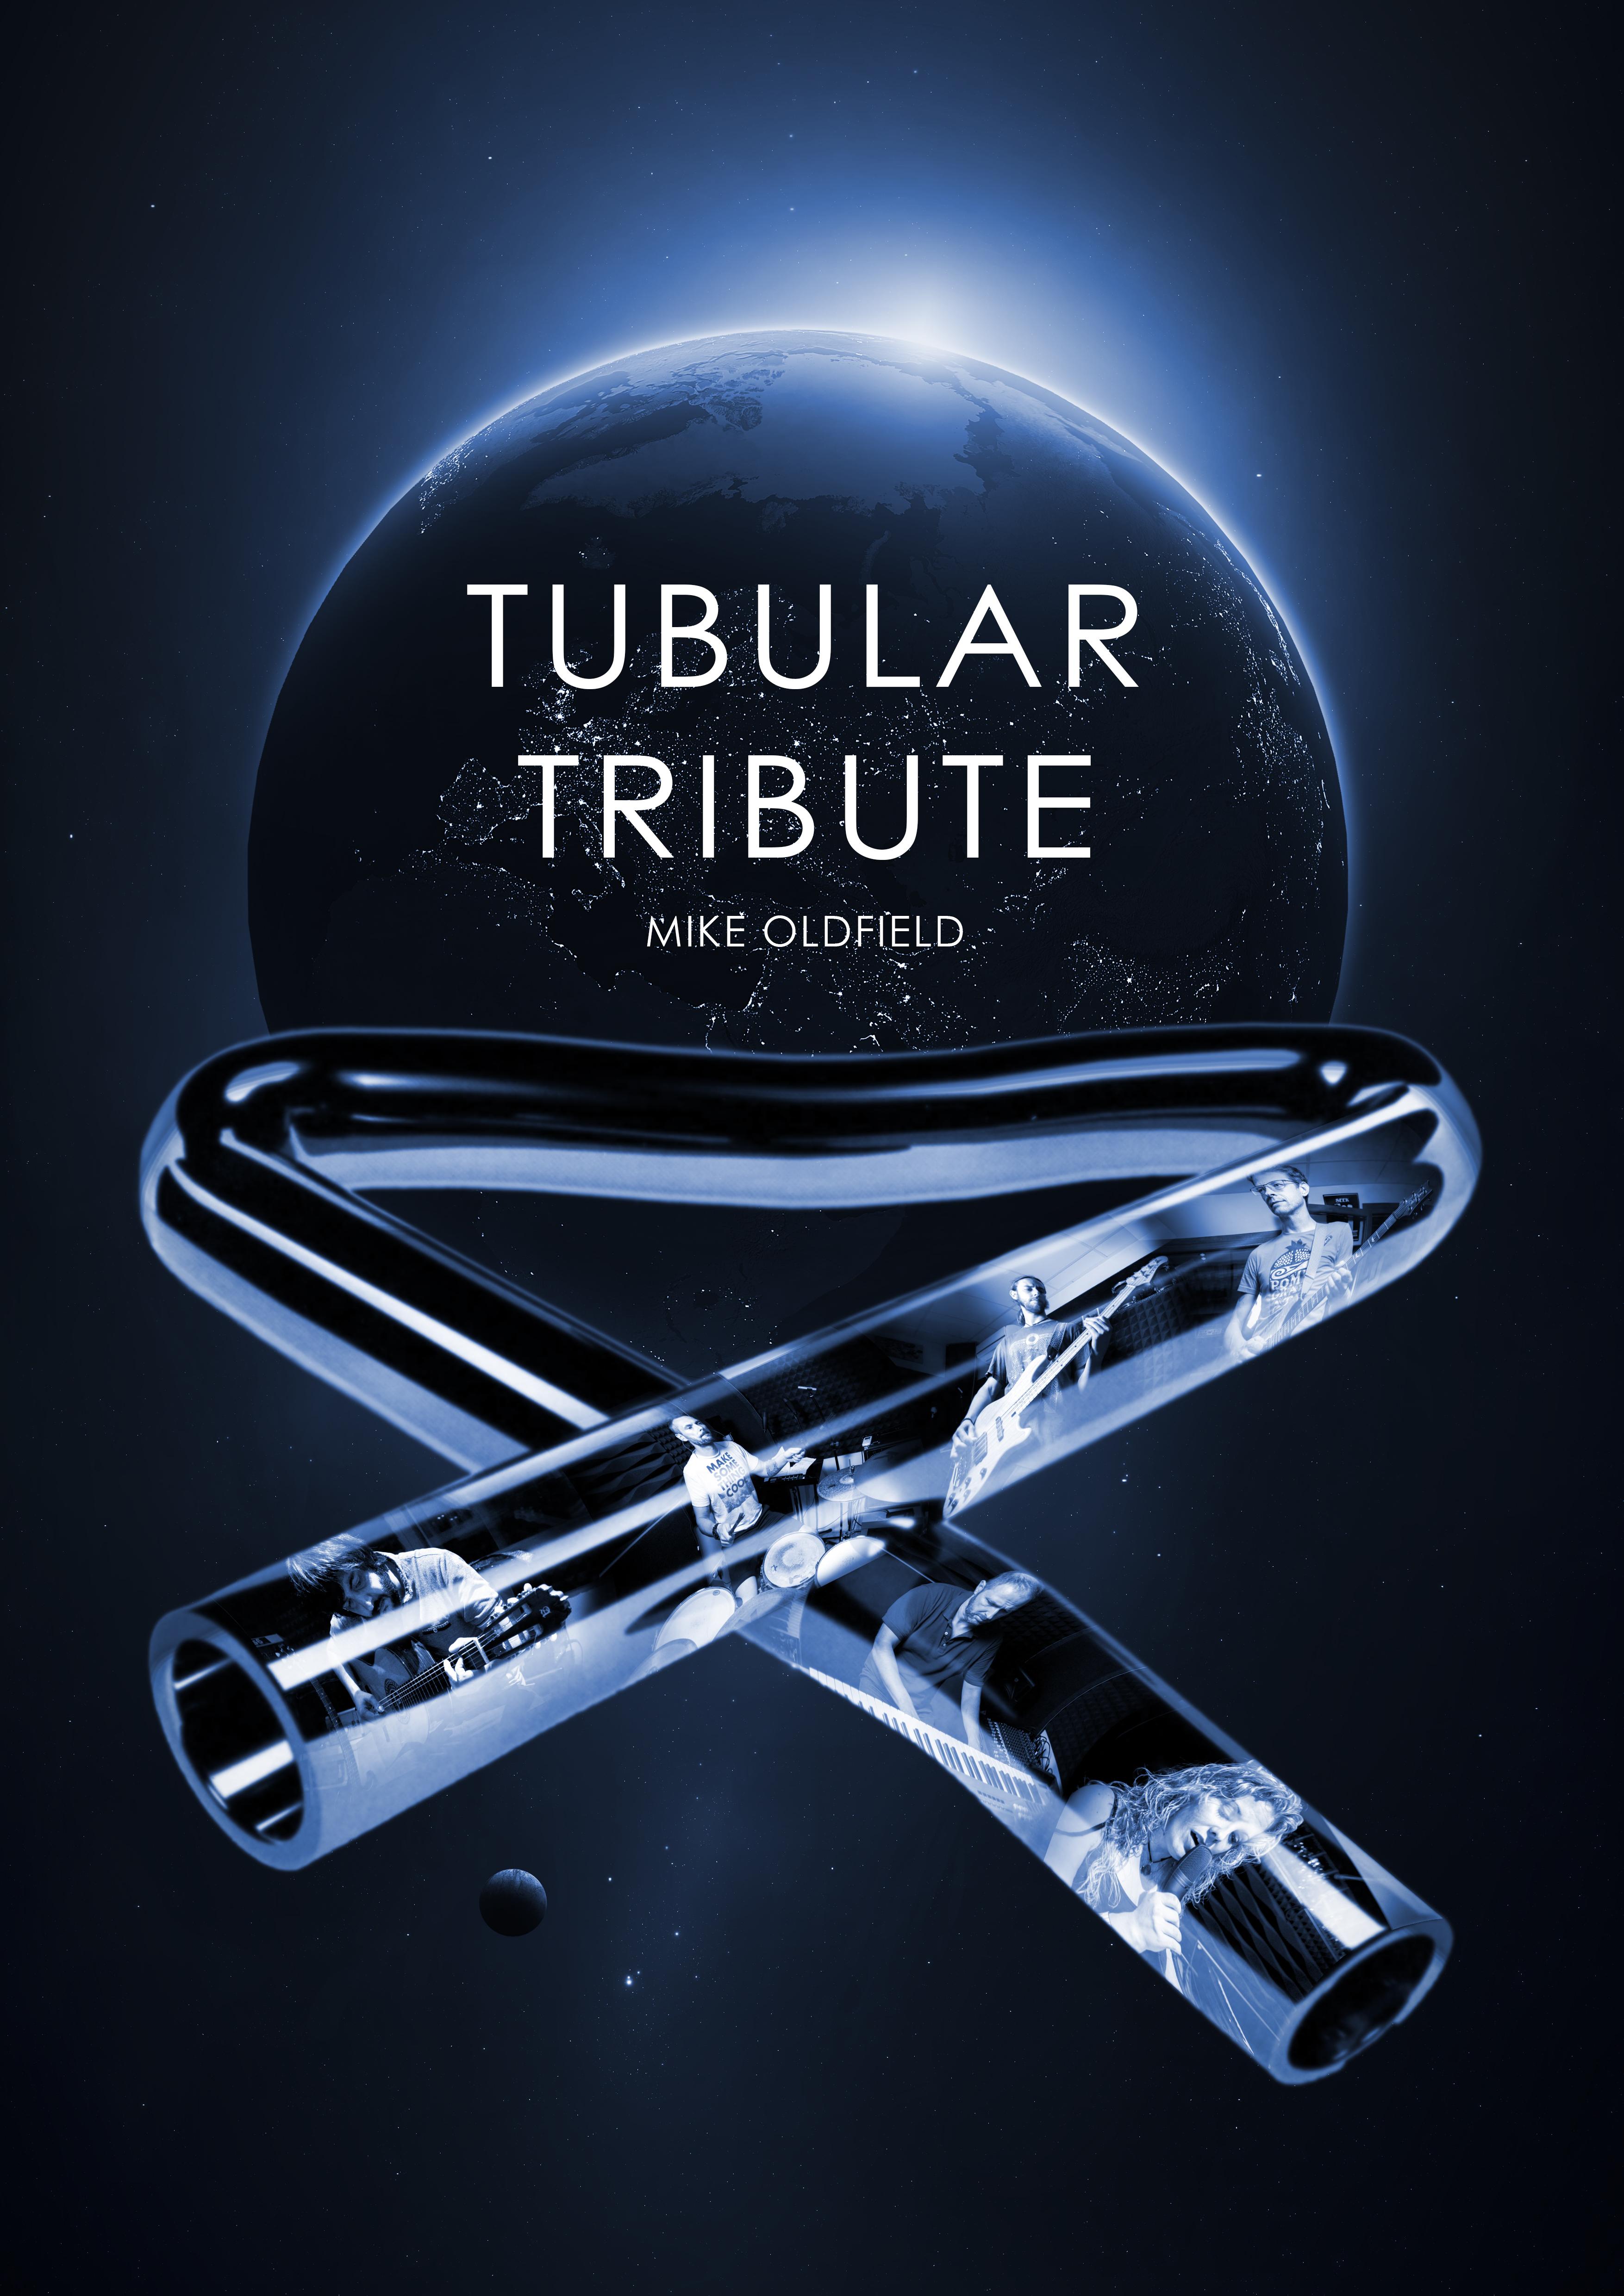 Tubular Tribute: Mike Oldfield